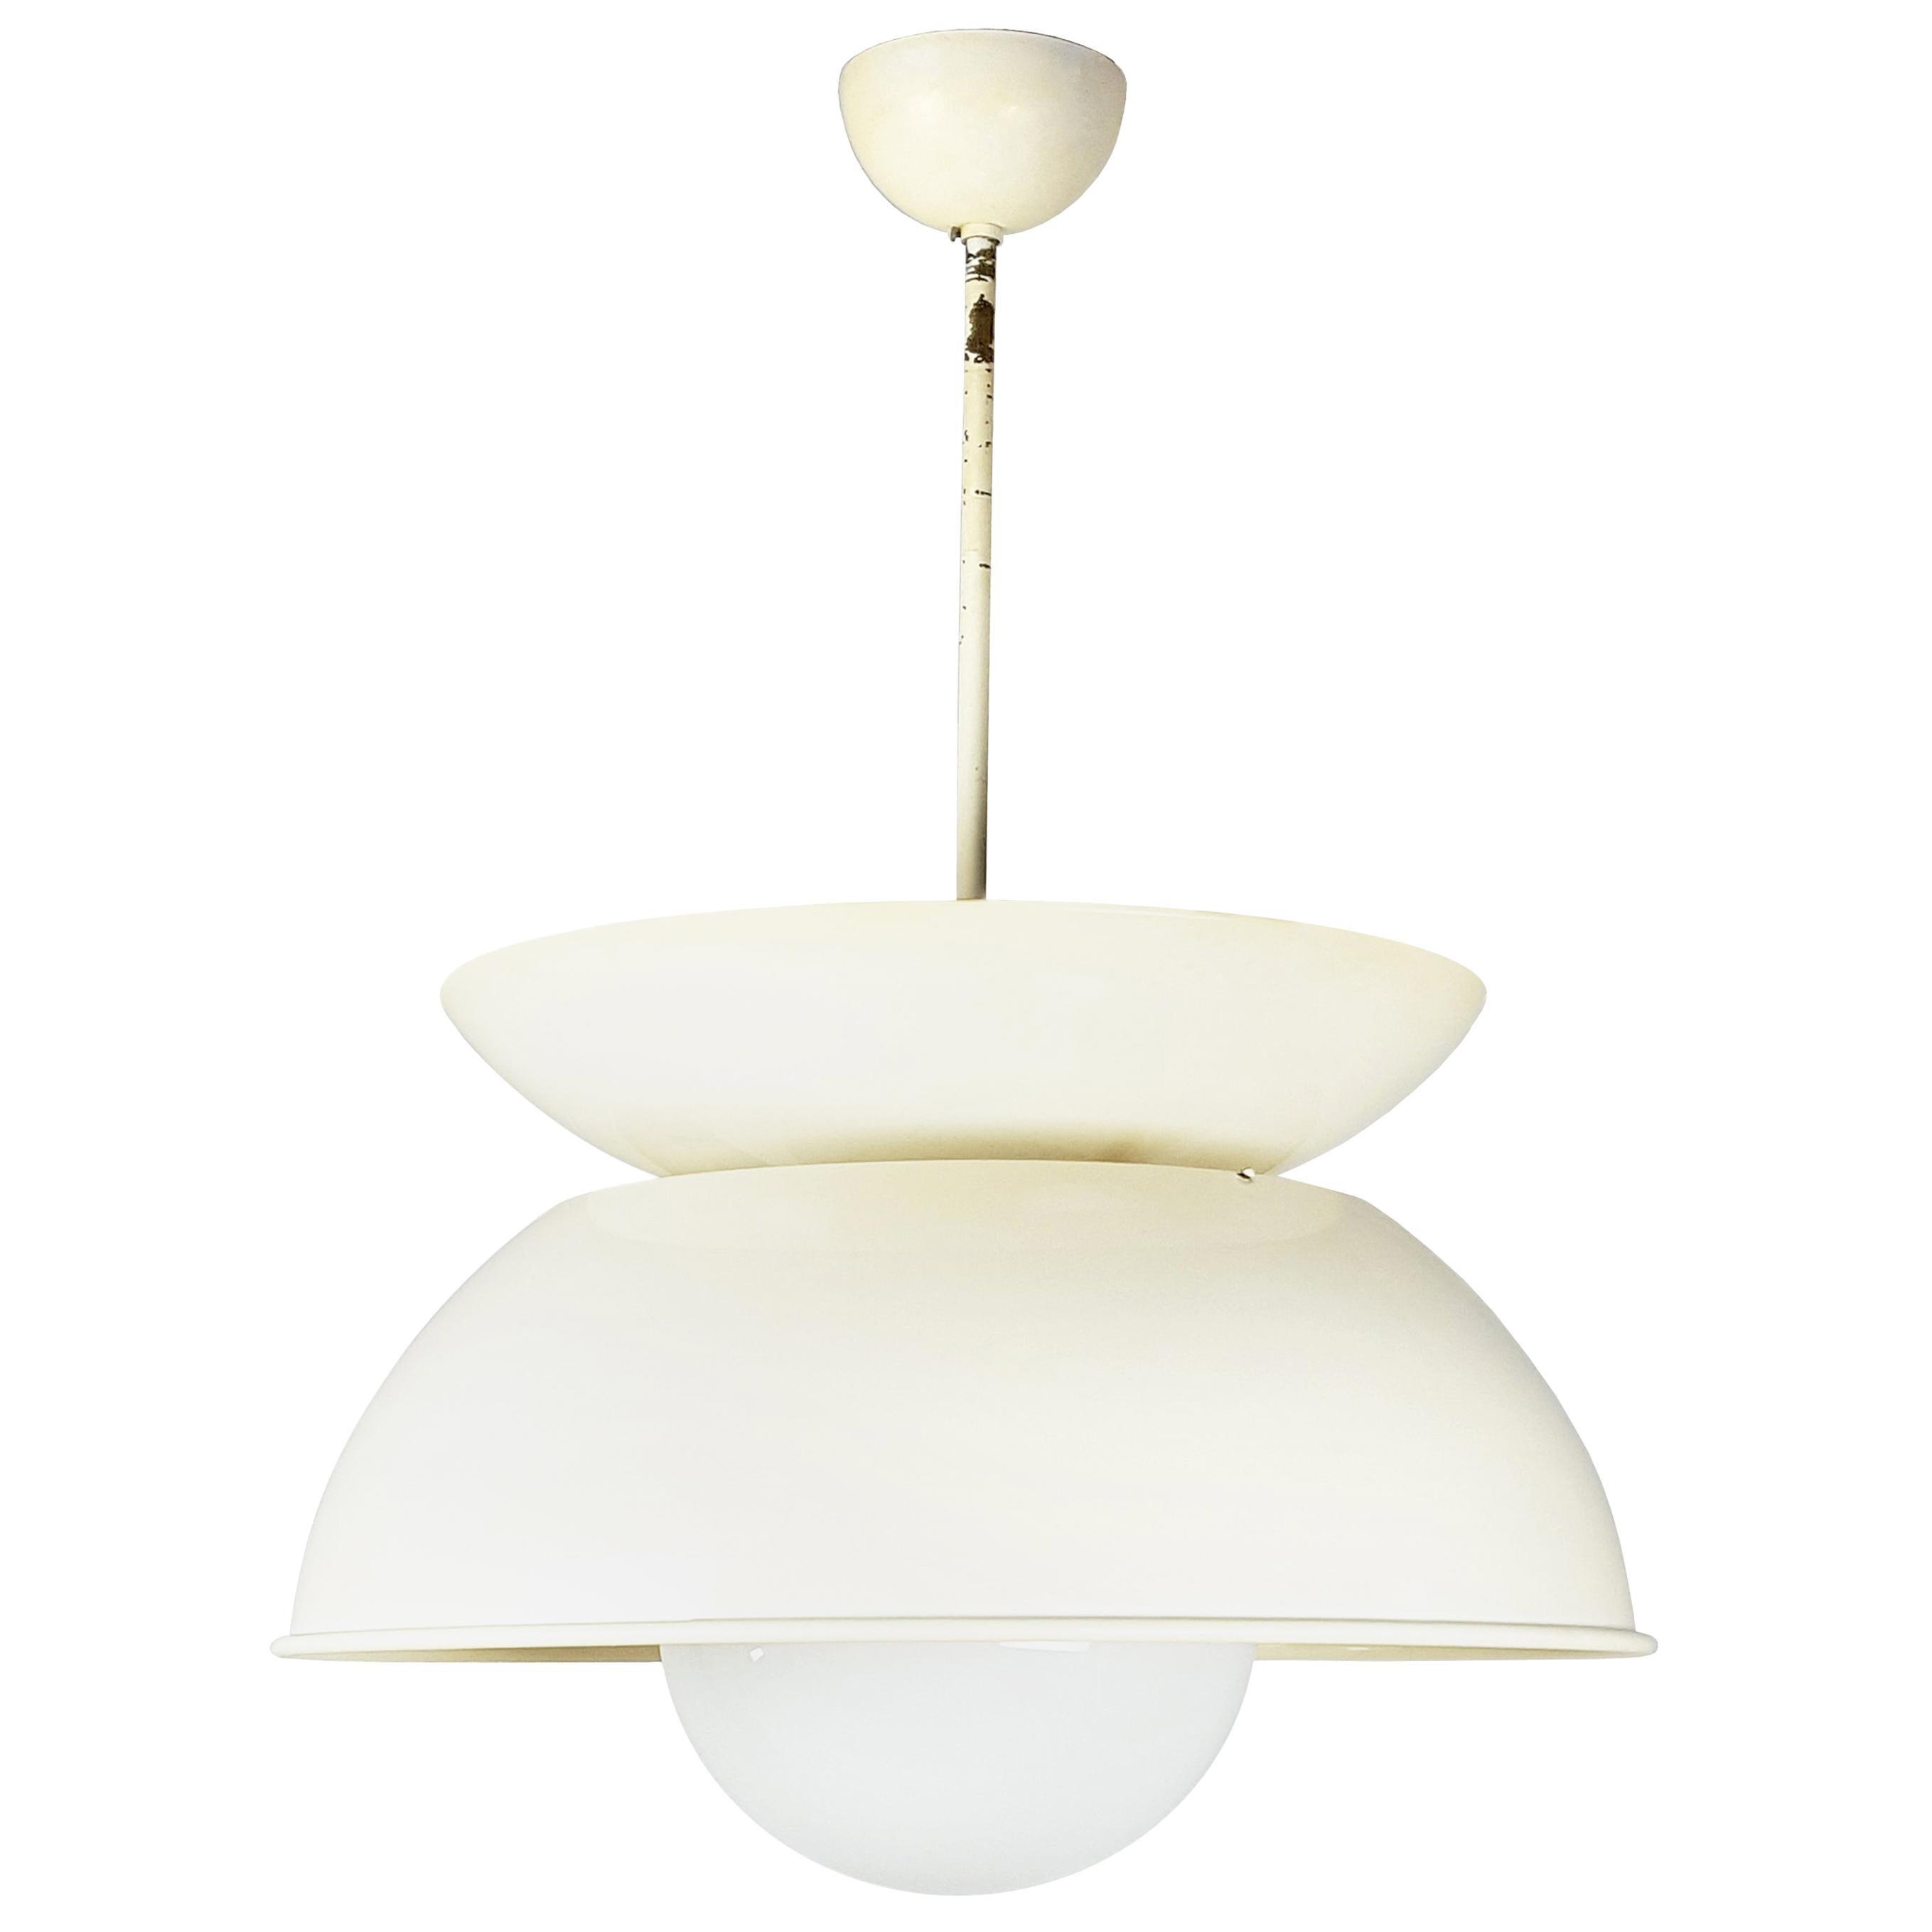 White/Ivory 1960s Cetra Pendant Lamp by V. Magistretti for Artemide